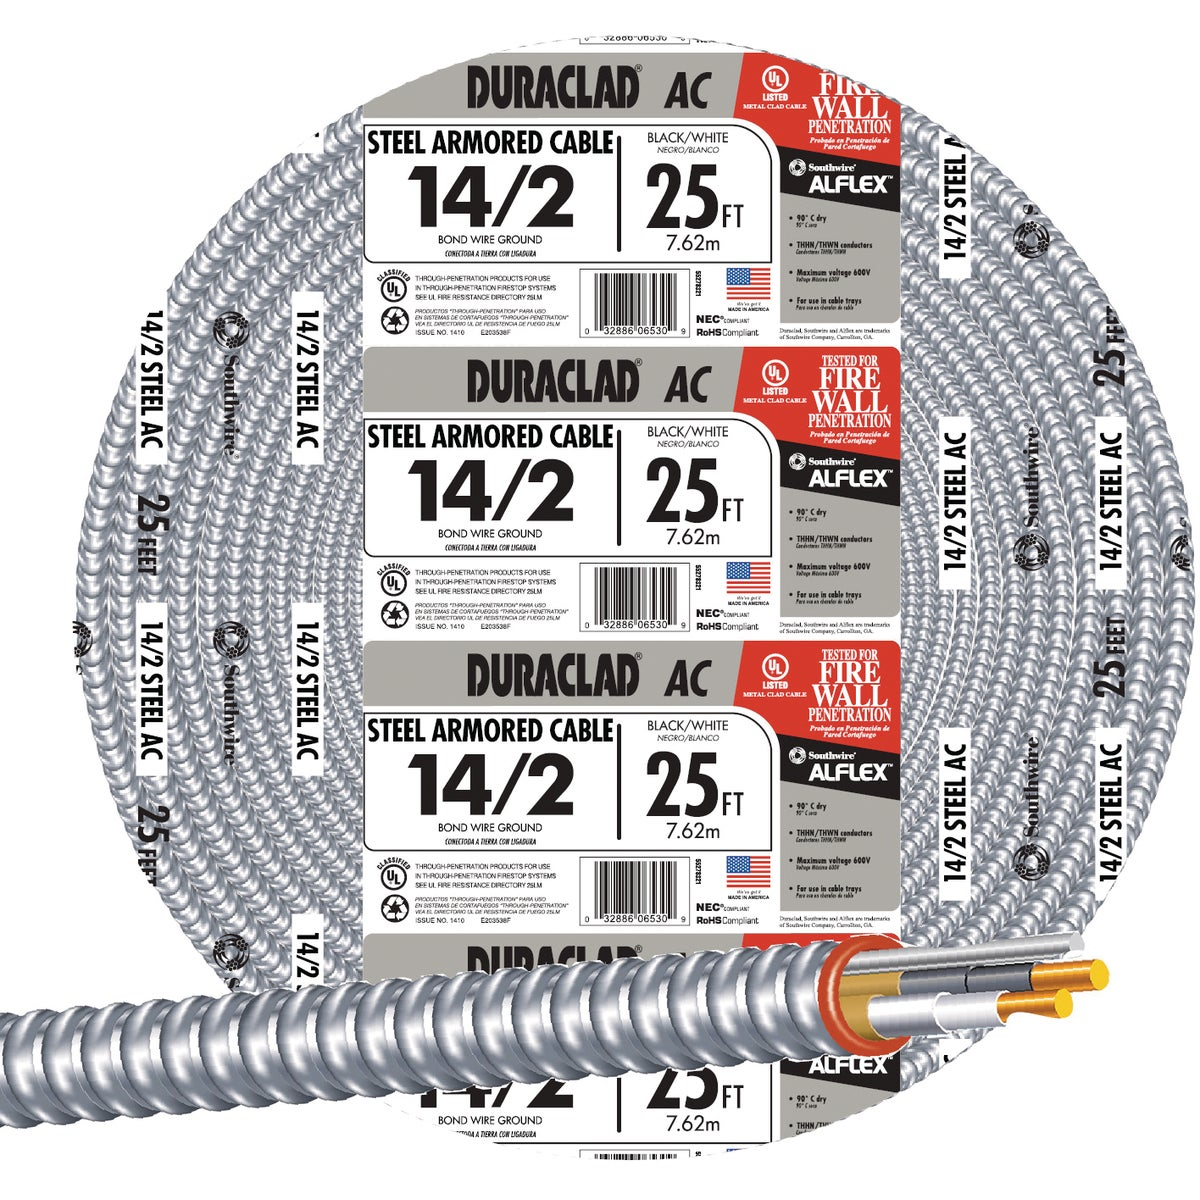 25' 14/2 Stl Armor Cable